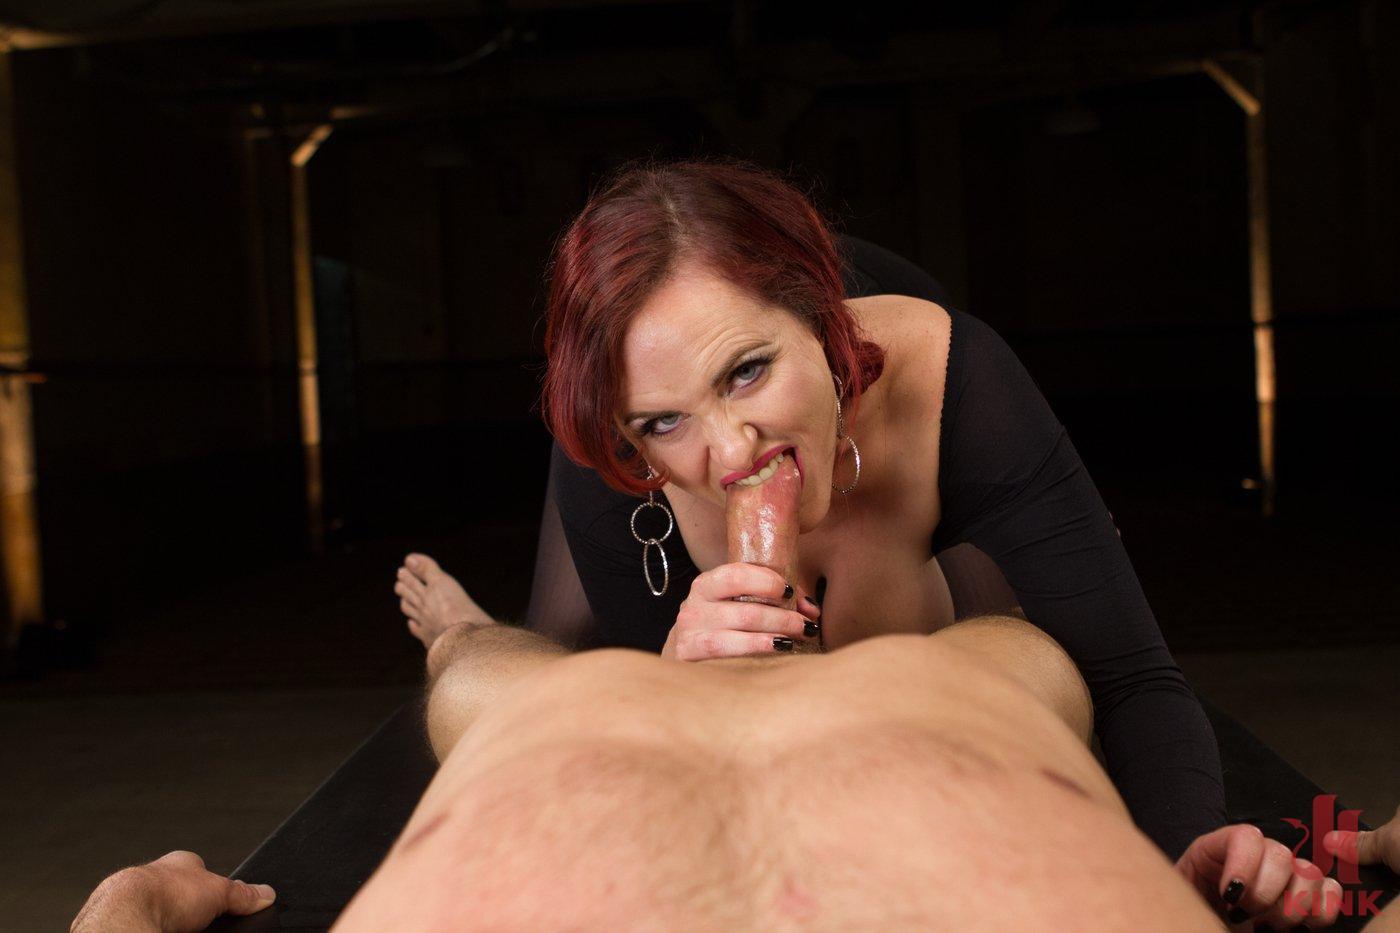 amusing mature sex xxx erotic can suggest visit you